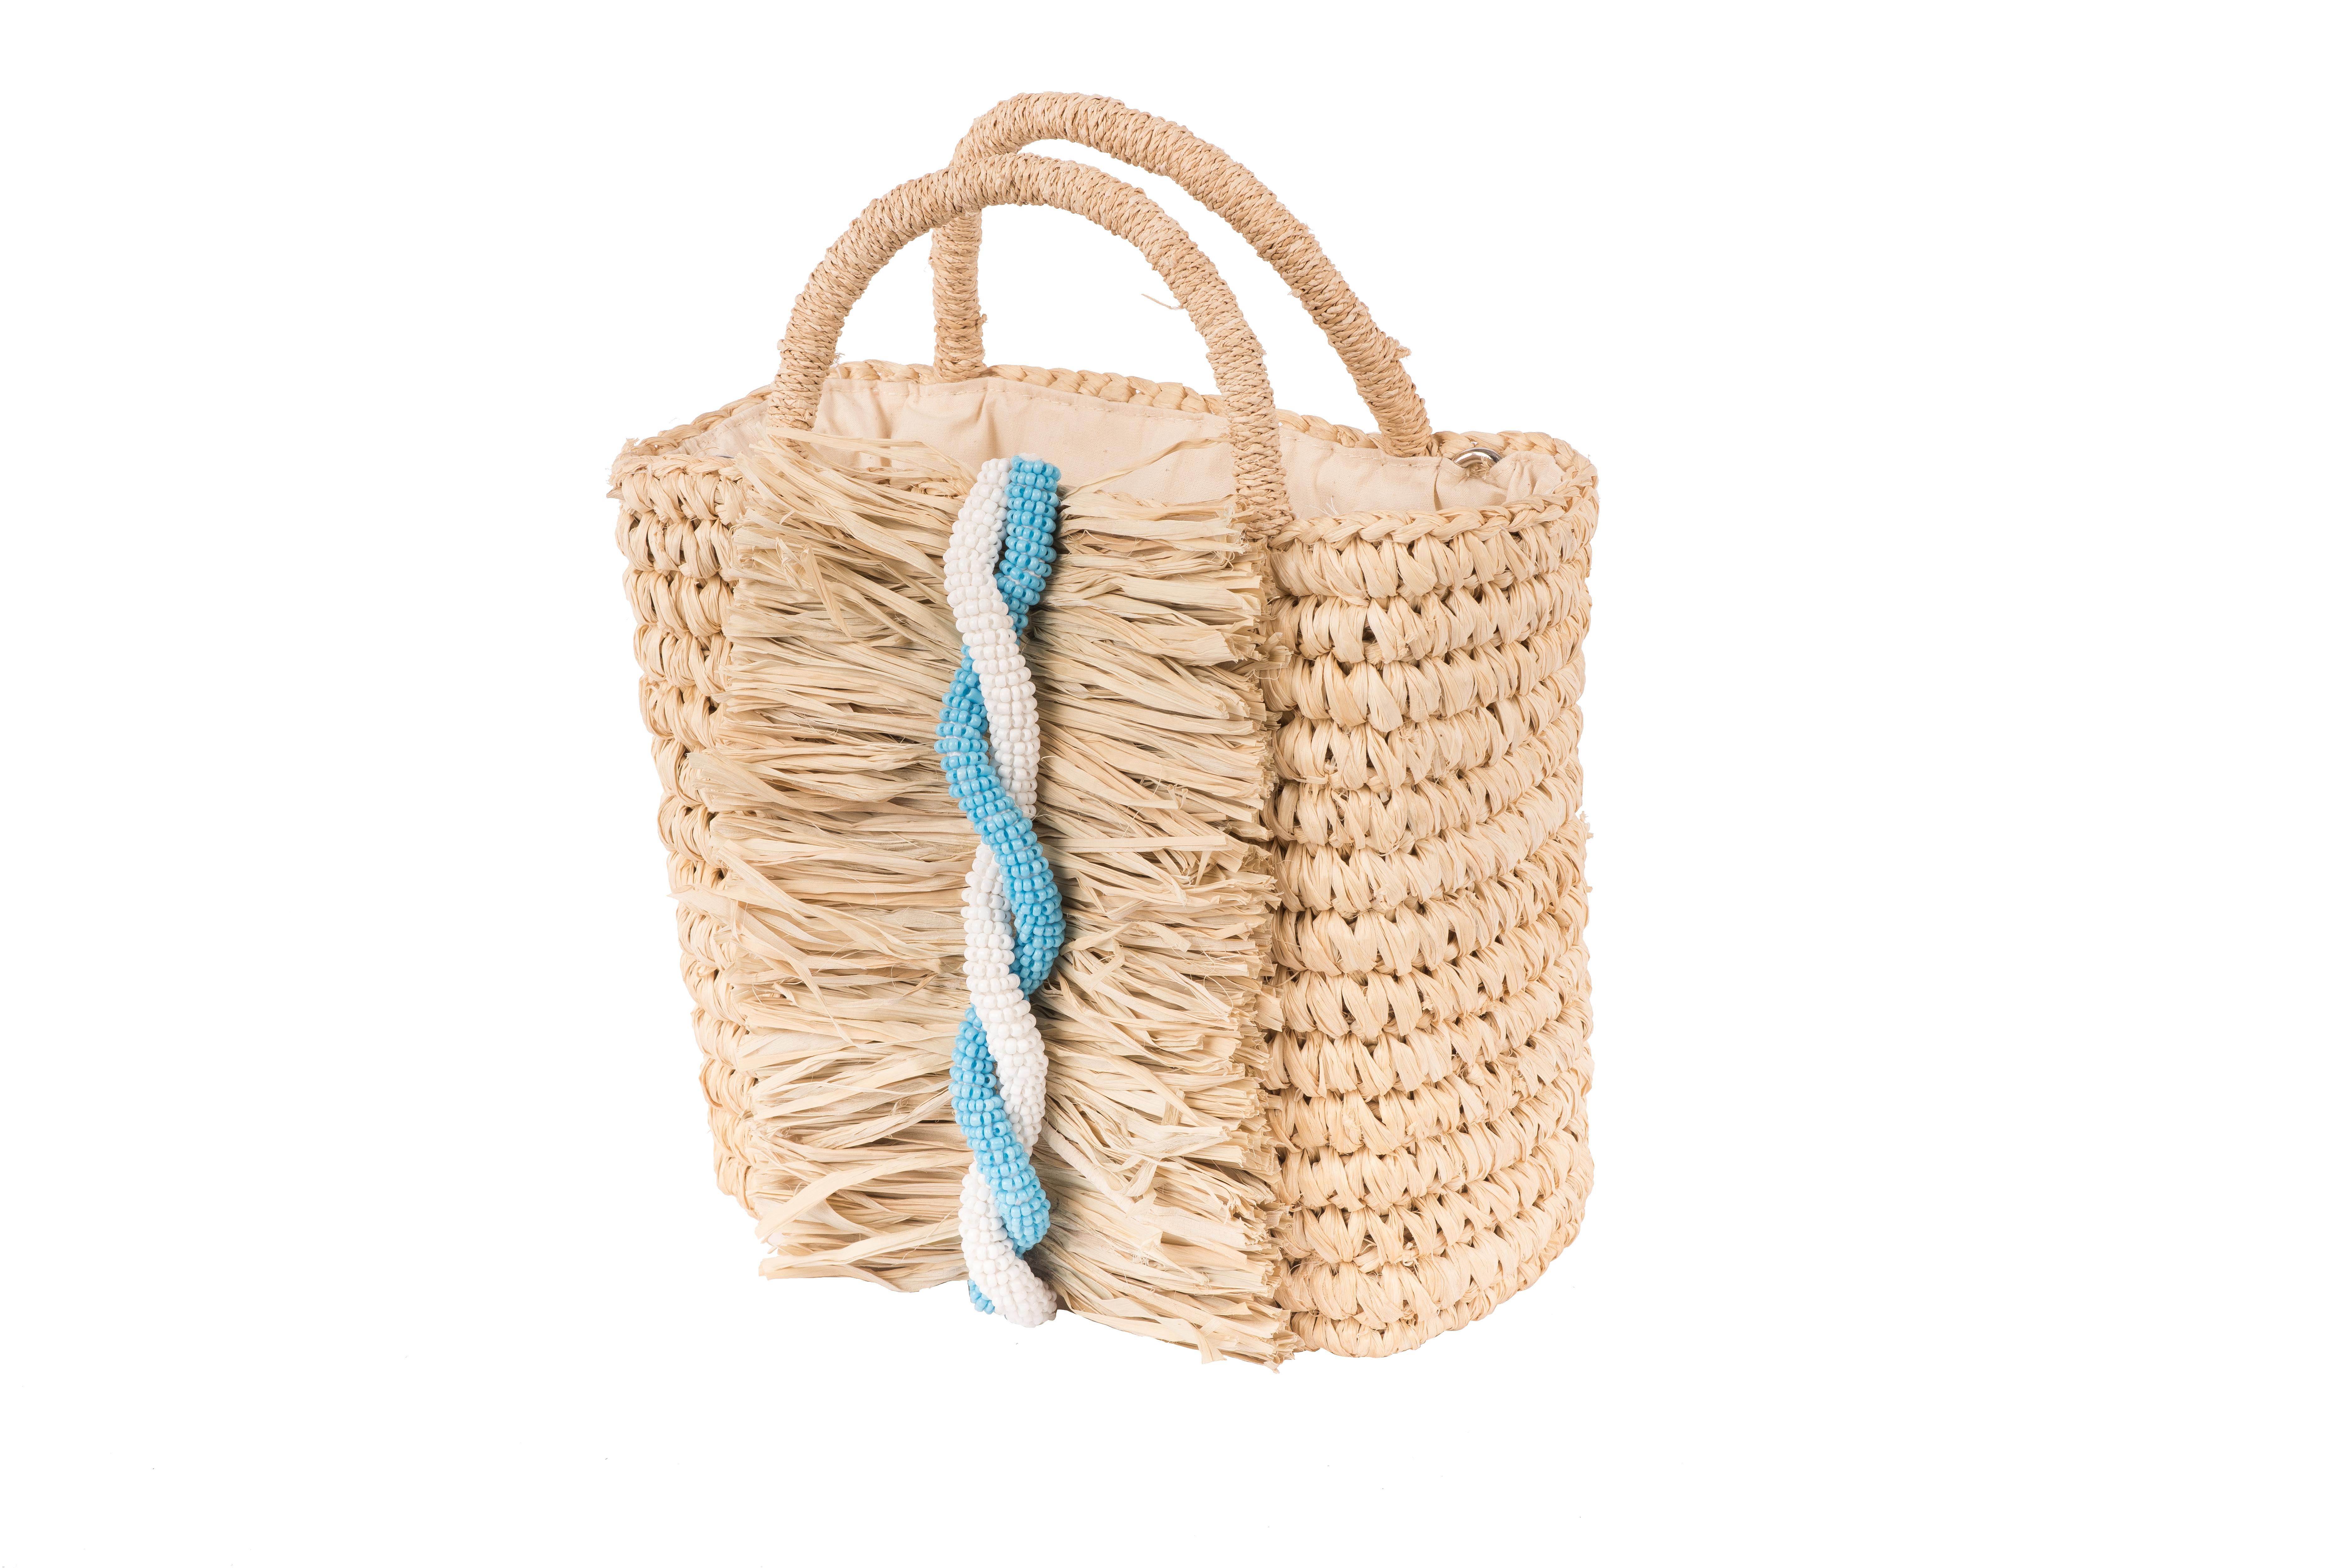 Ocean Twist Bag - Mini by Madebywave on curated-crowd.com